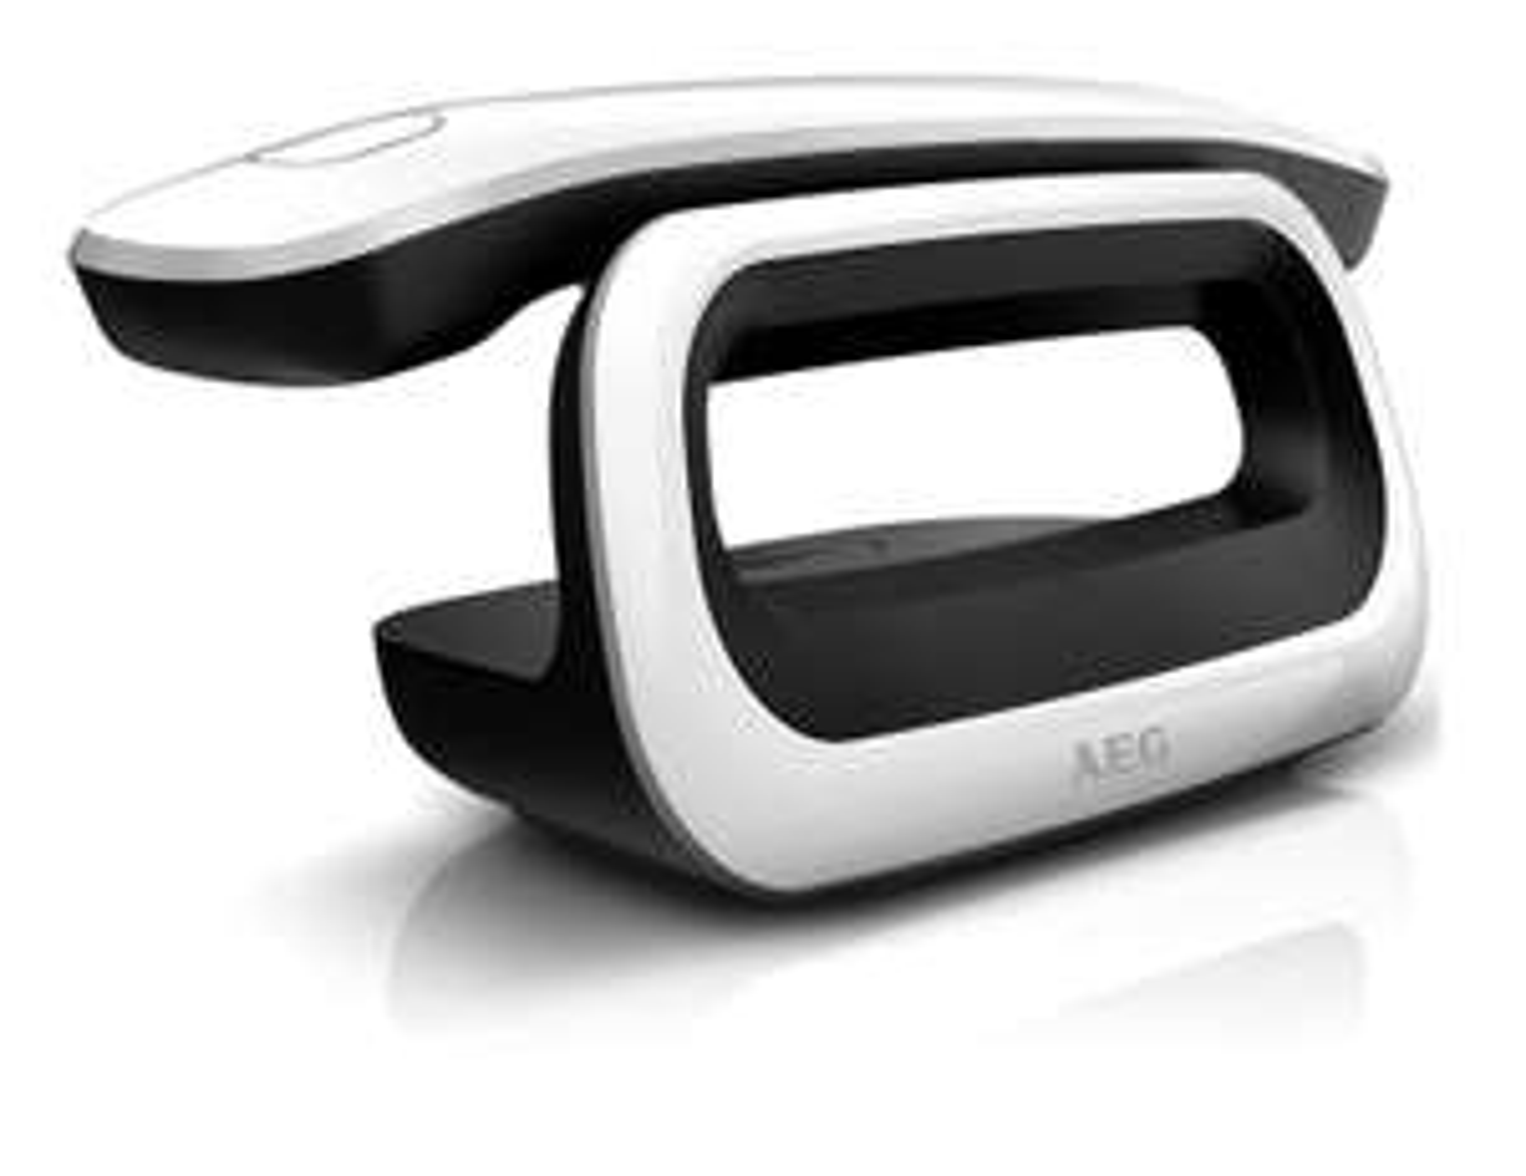 Téléphone fixe sans-fil AEG Loop (via ODR 15€)